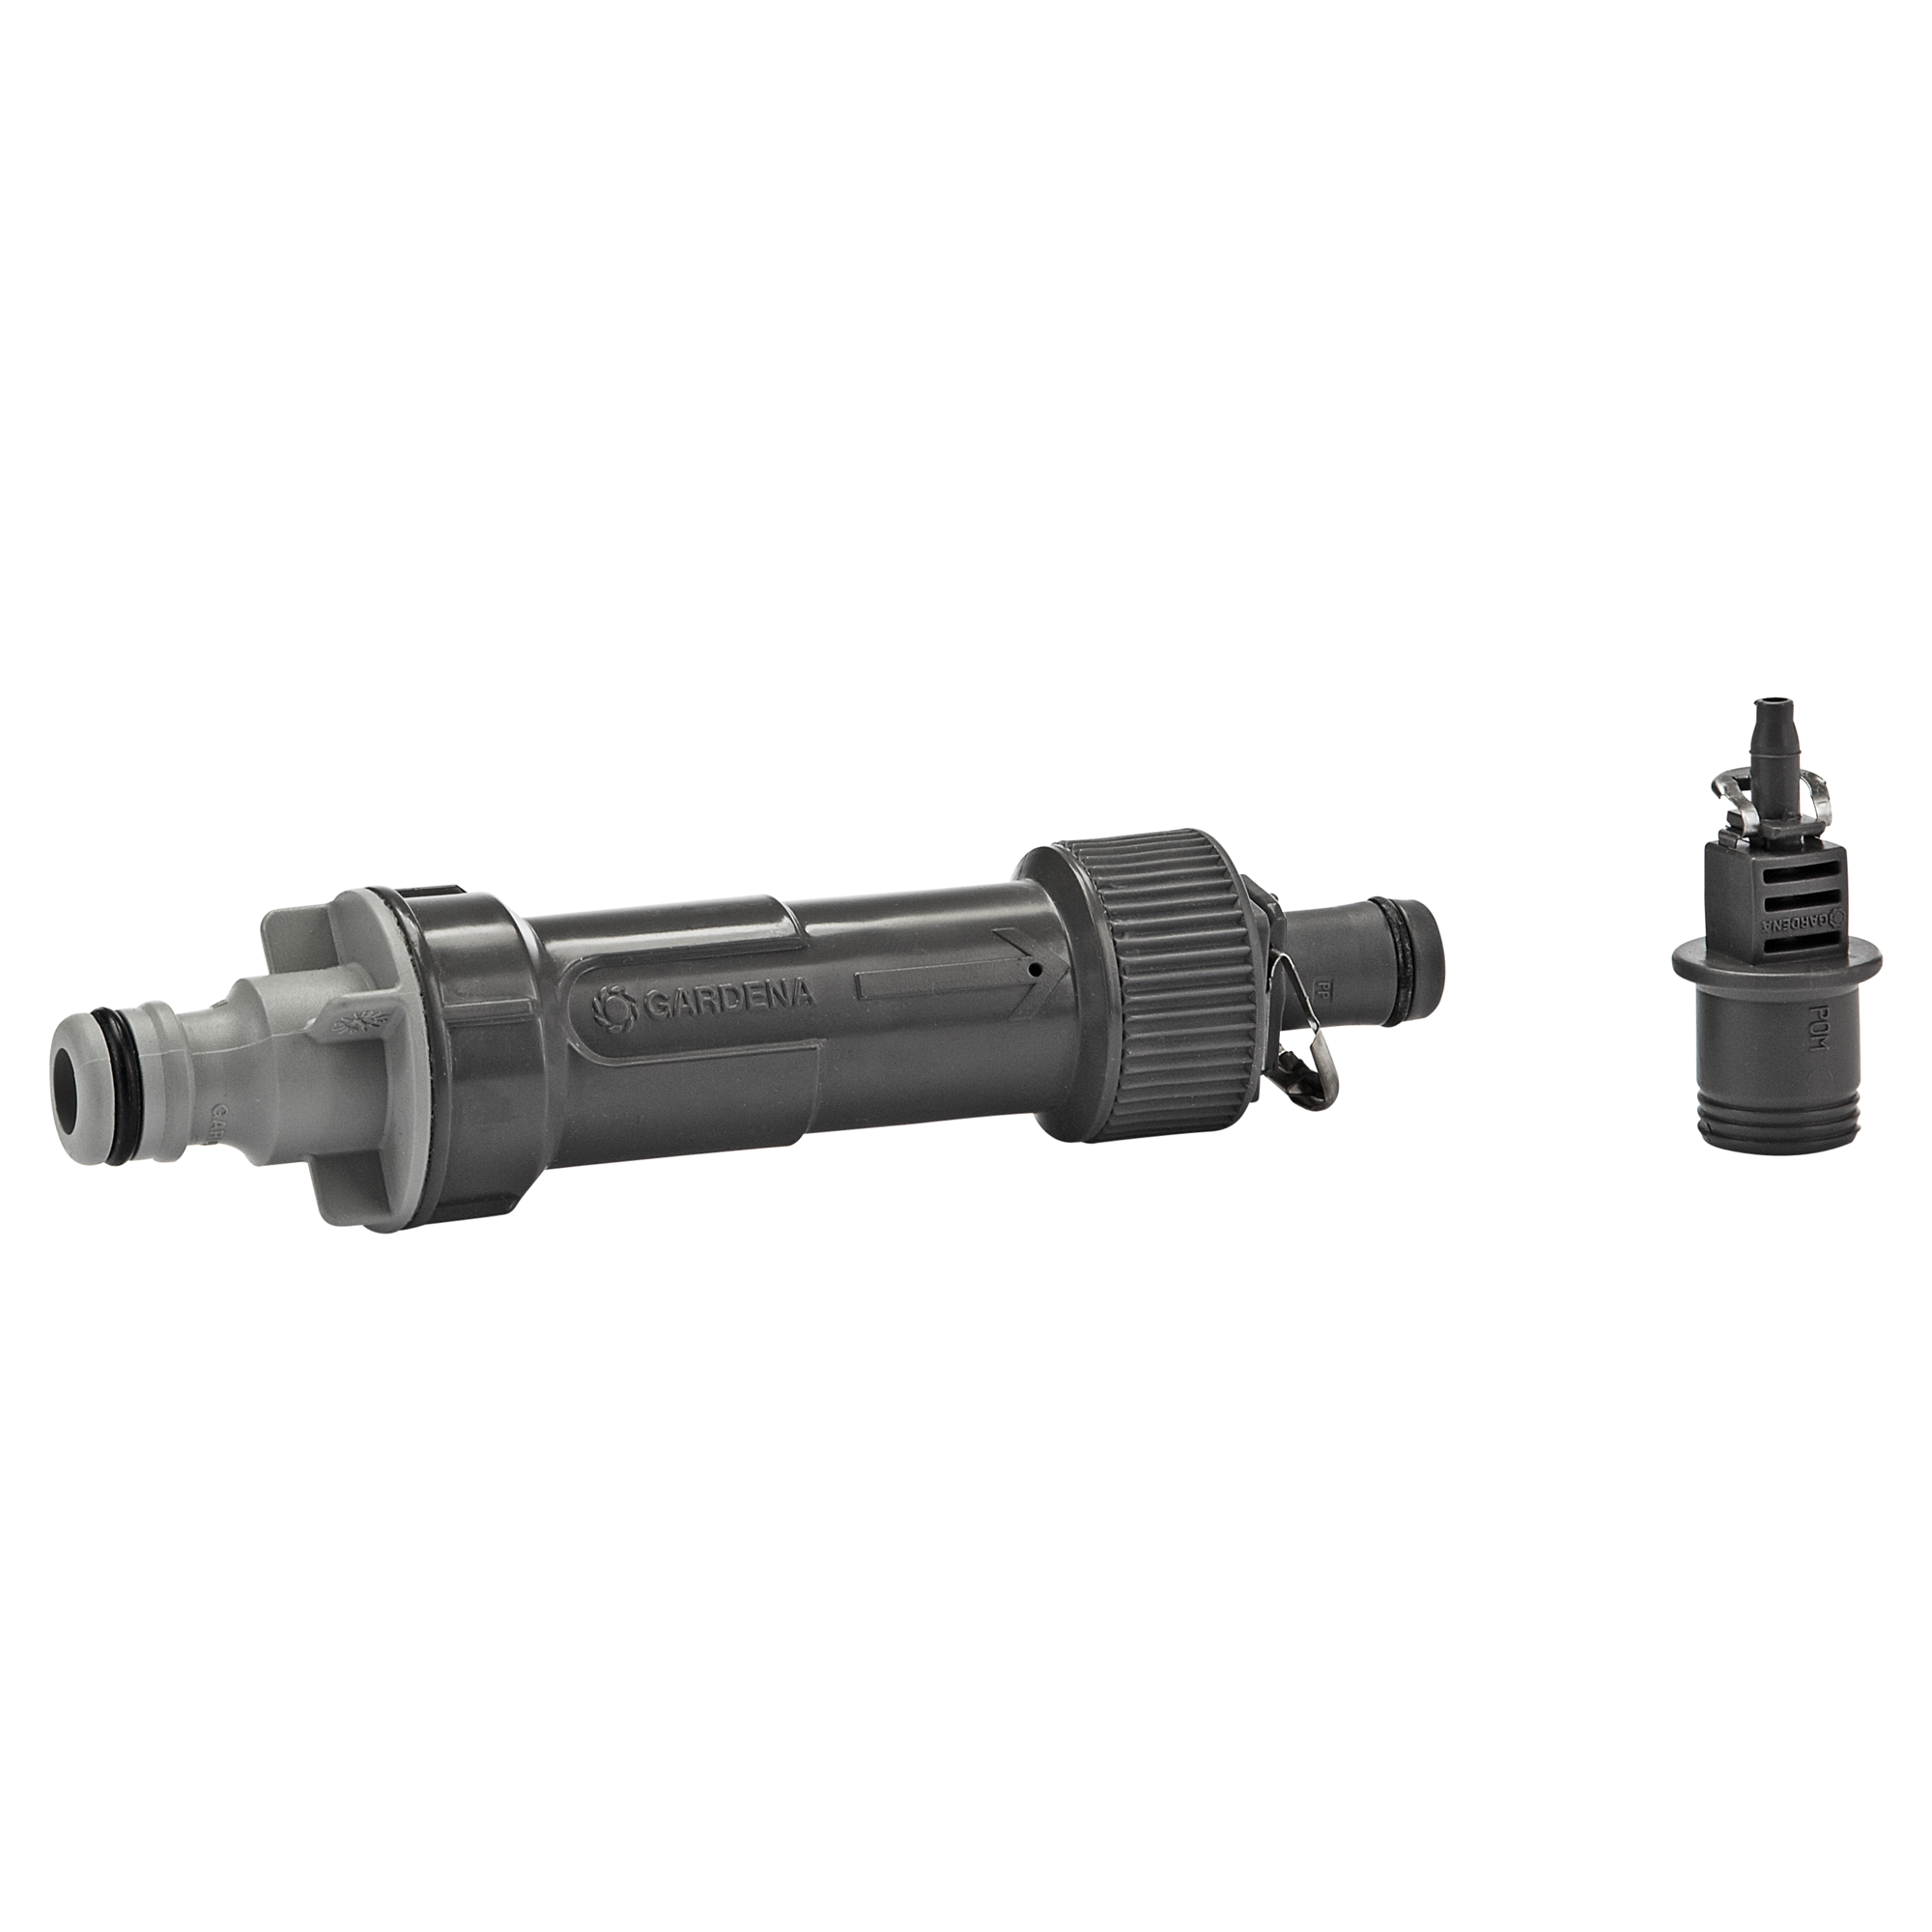 Gardena Basisgerät 1000 für Micro-Drip-System